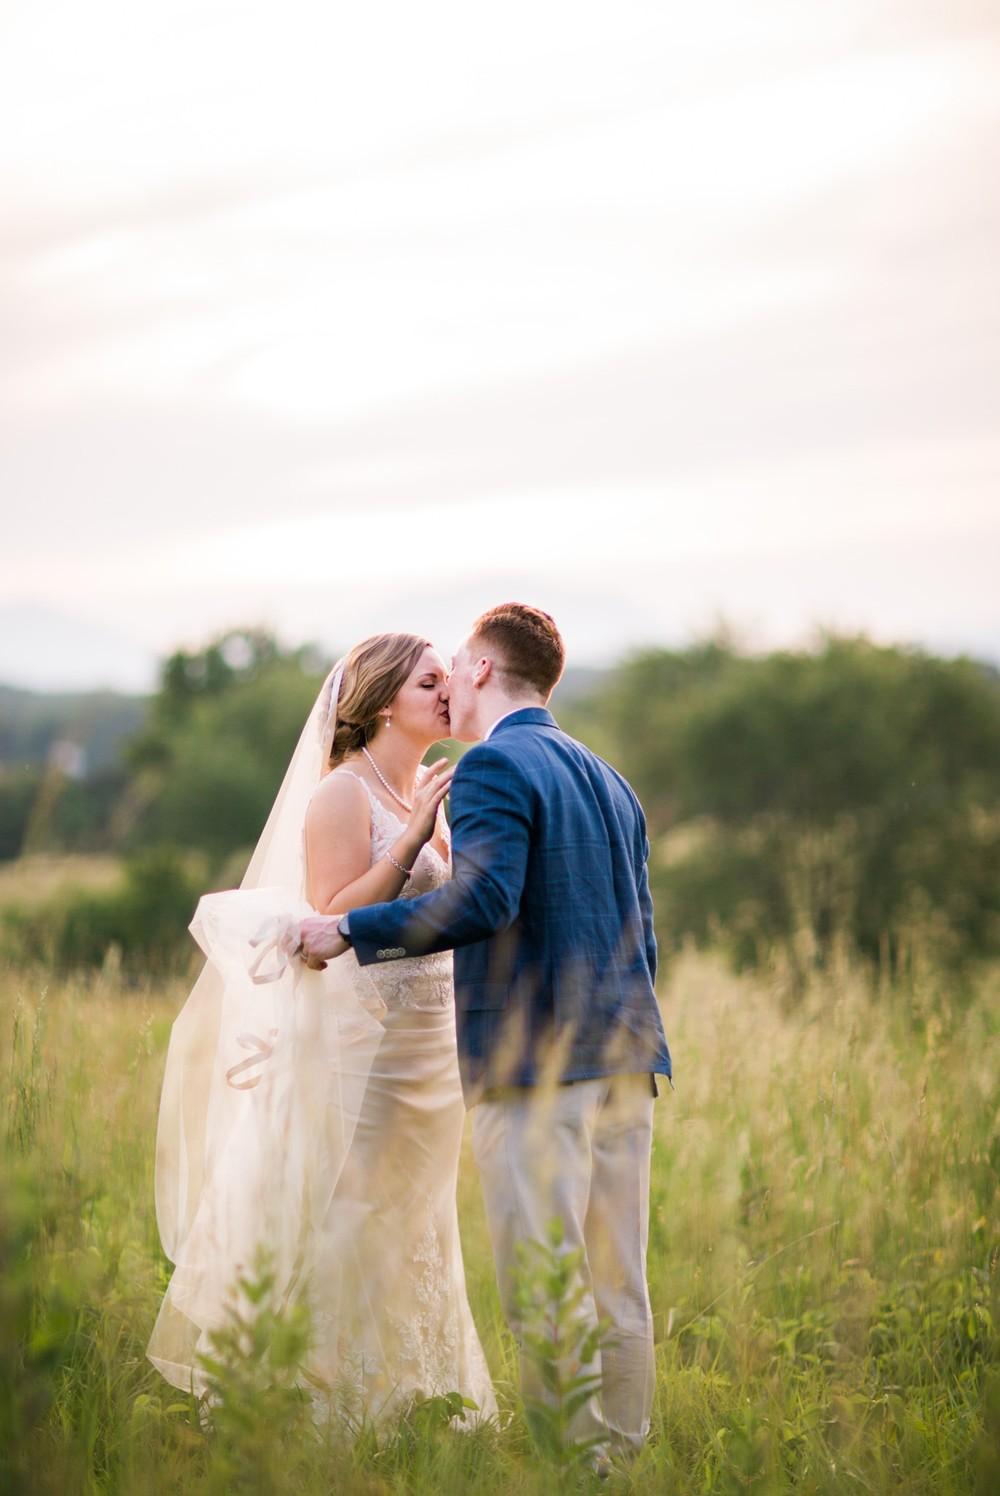 trivium_lynchburg_va_wedding_estate_wedding_photography_wedding_photographers (74).jpg